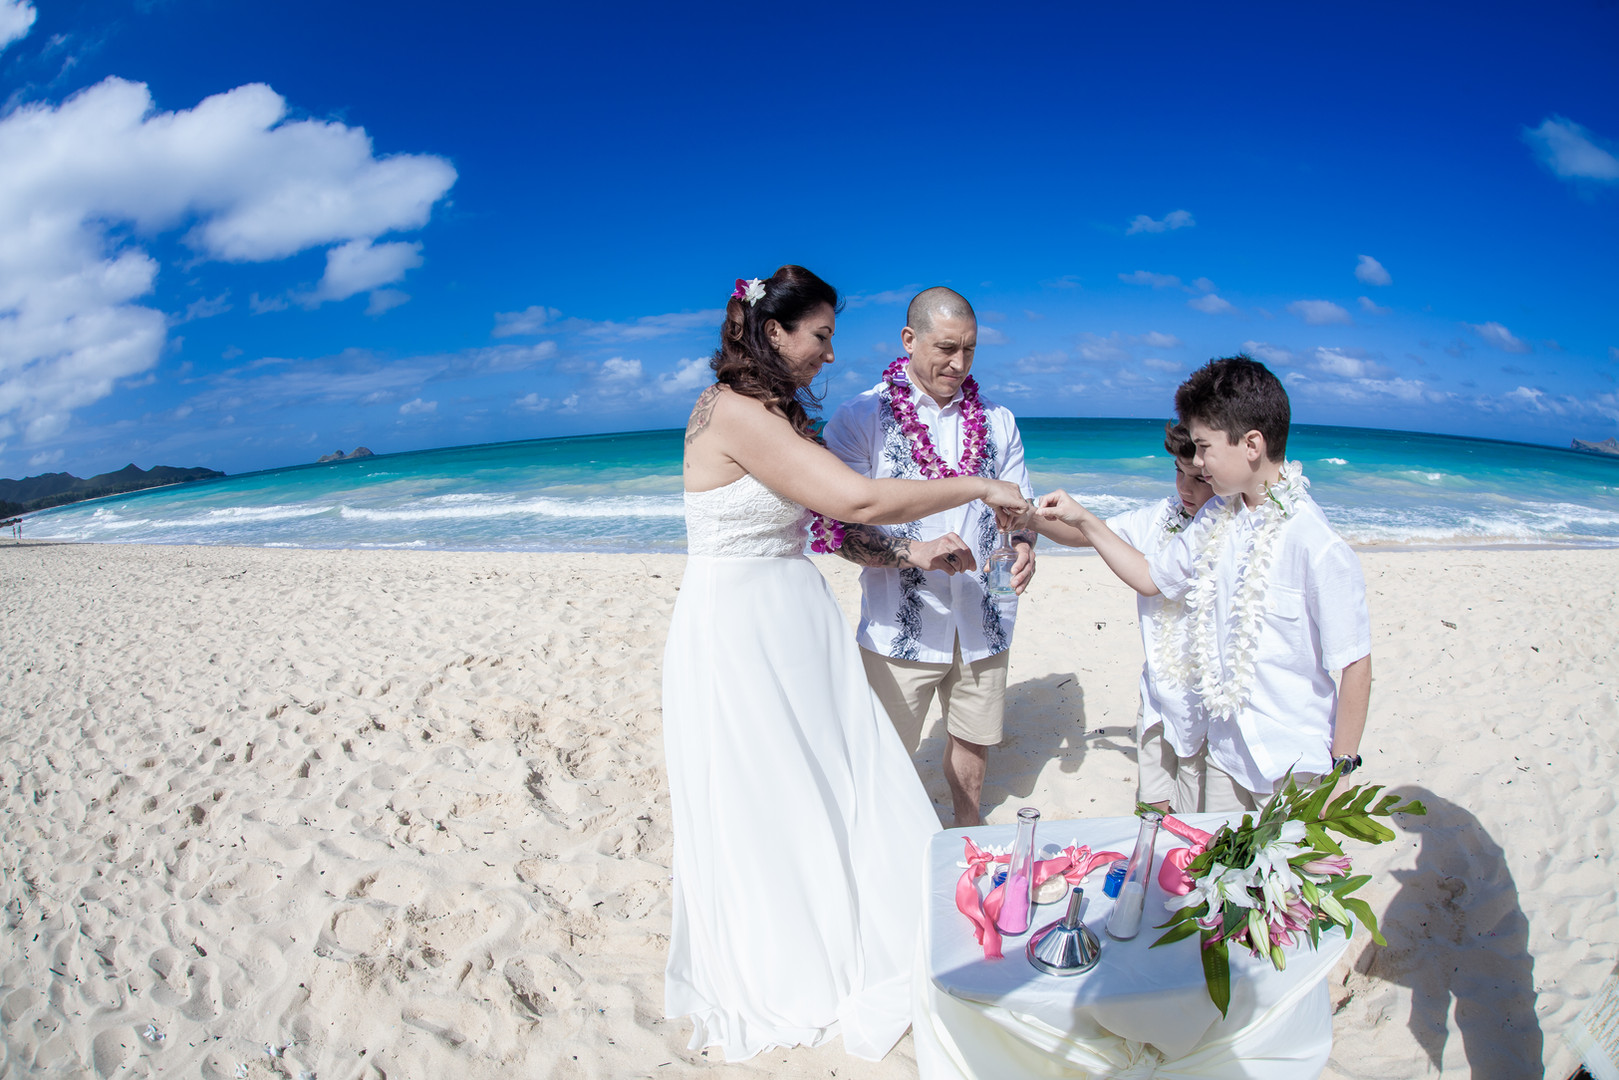 Wedding-picture-2-26.jpg